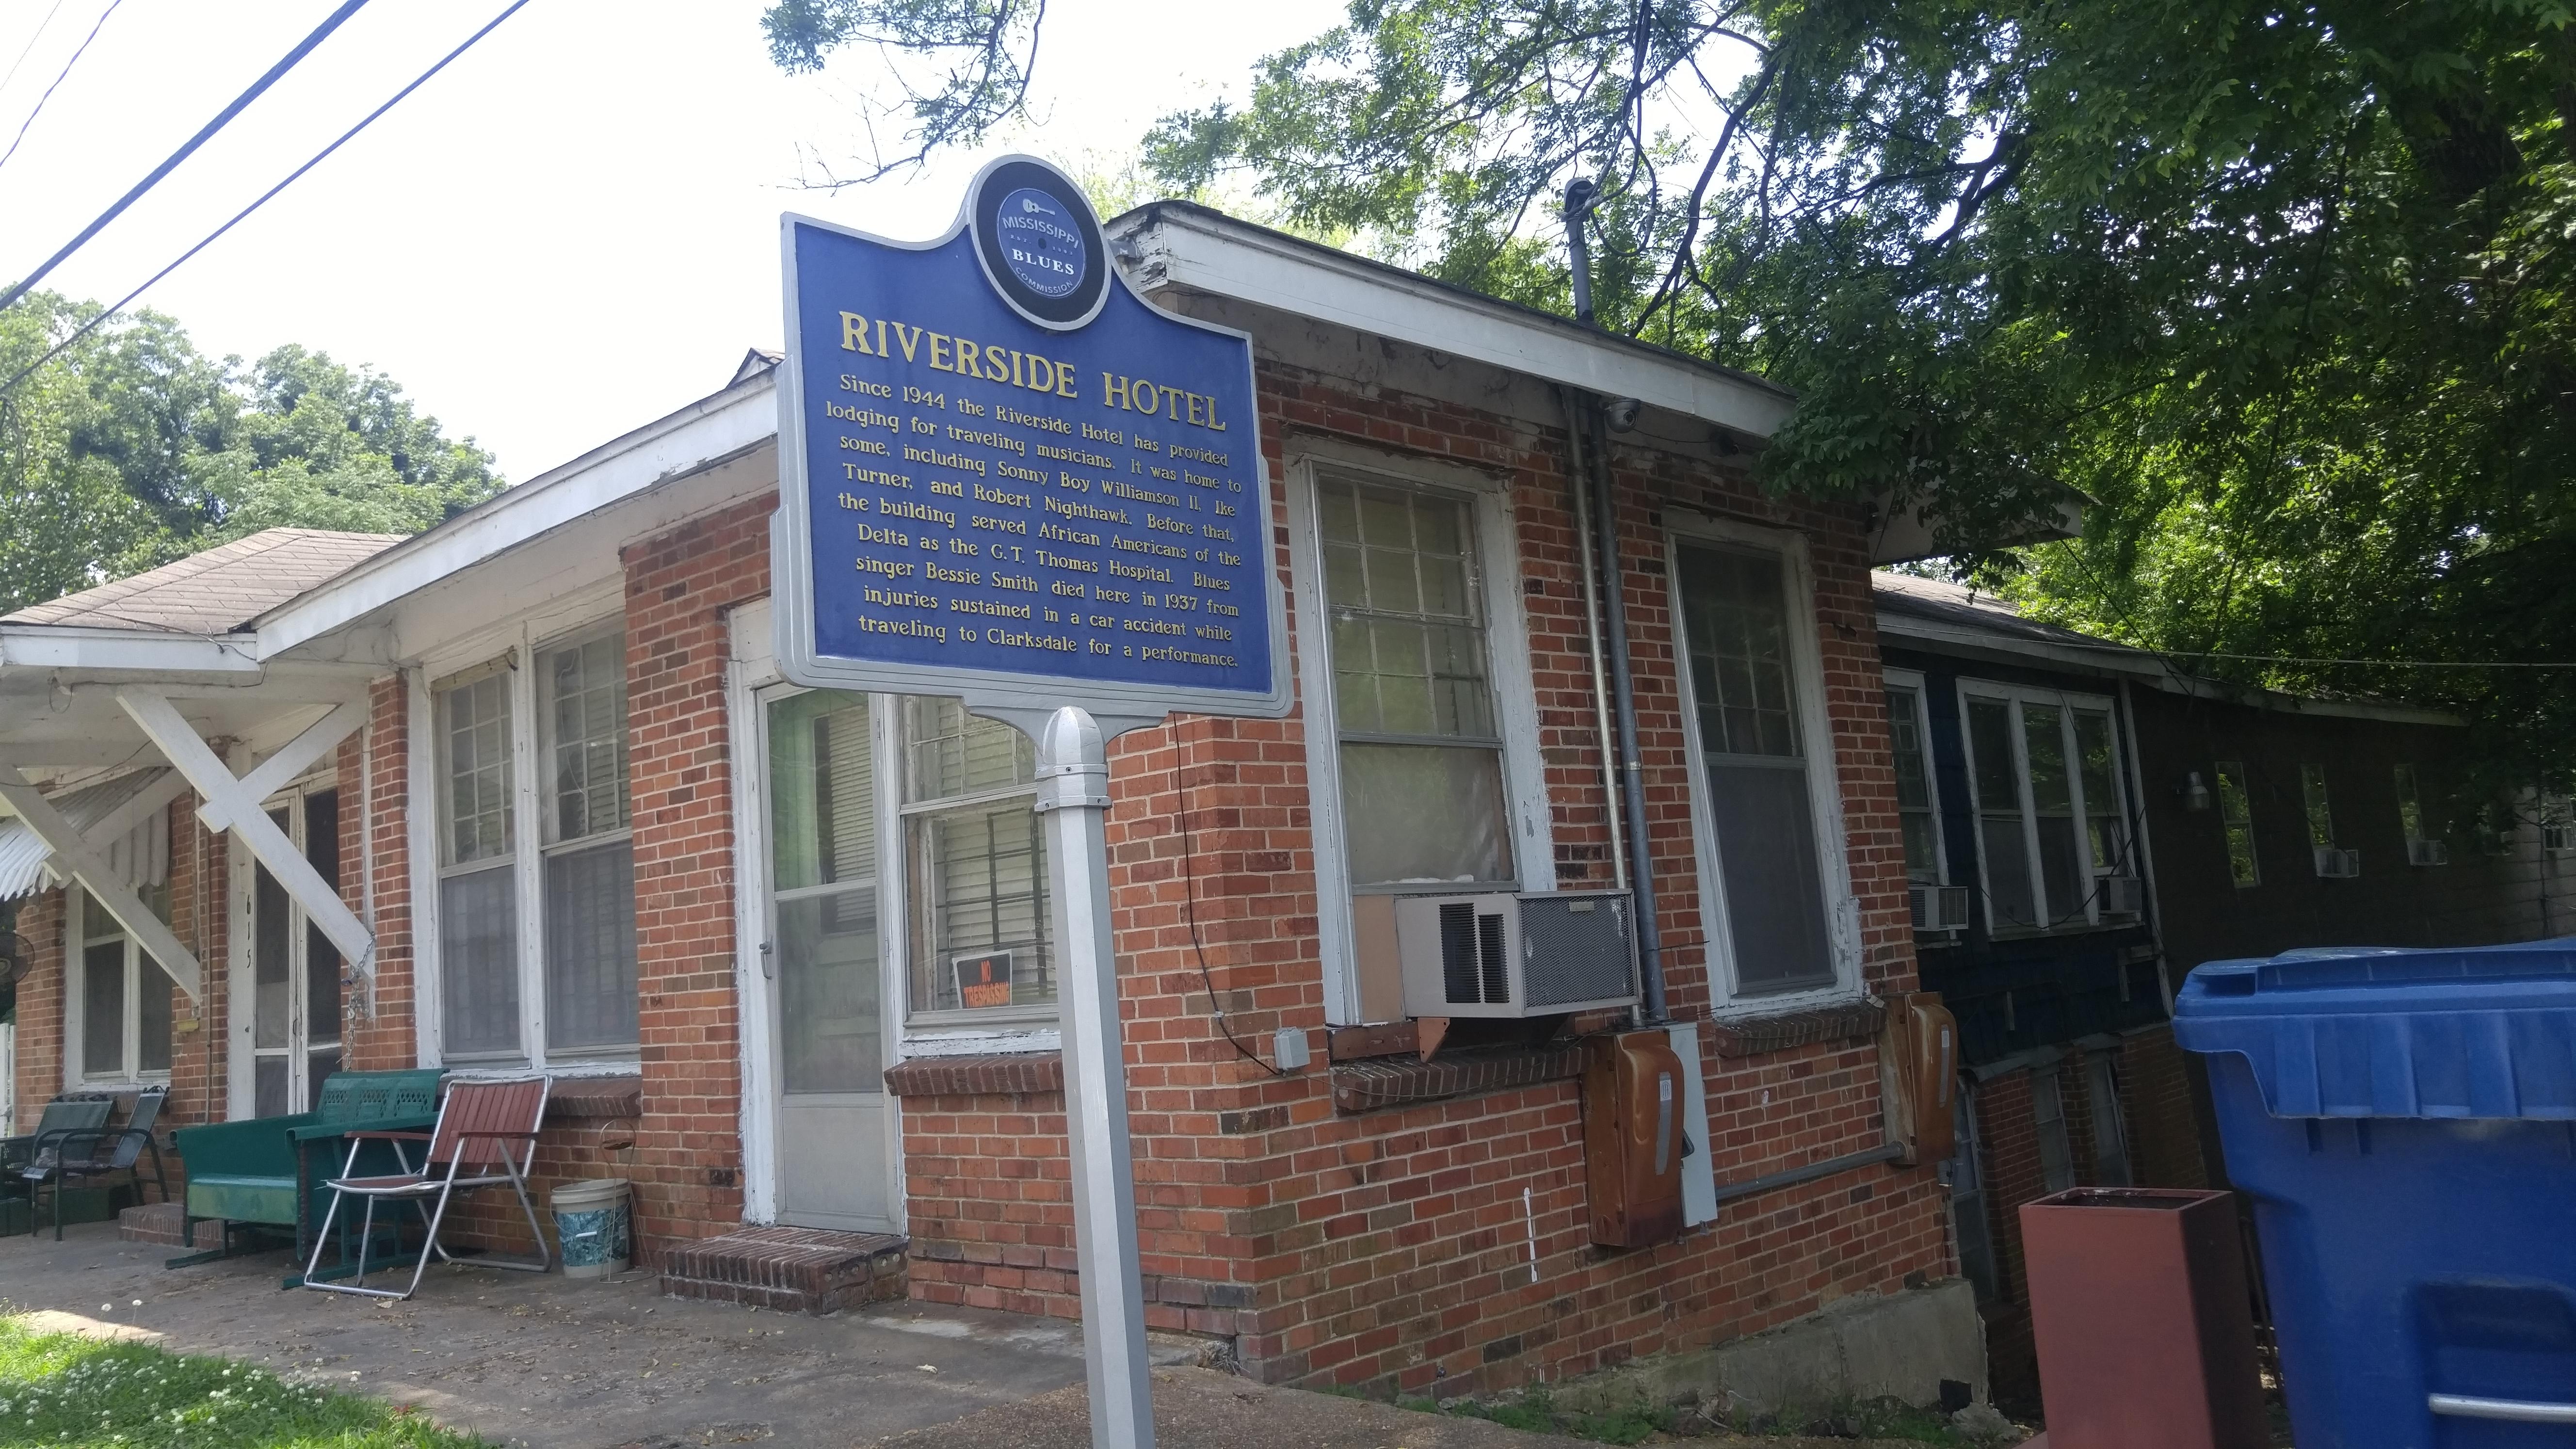 Riverside Hotel (Clarksdale, Mississippi) - Wikipedia